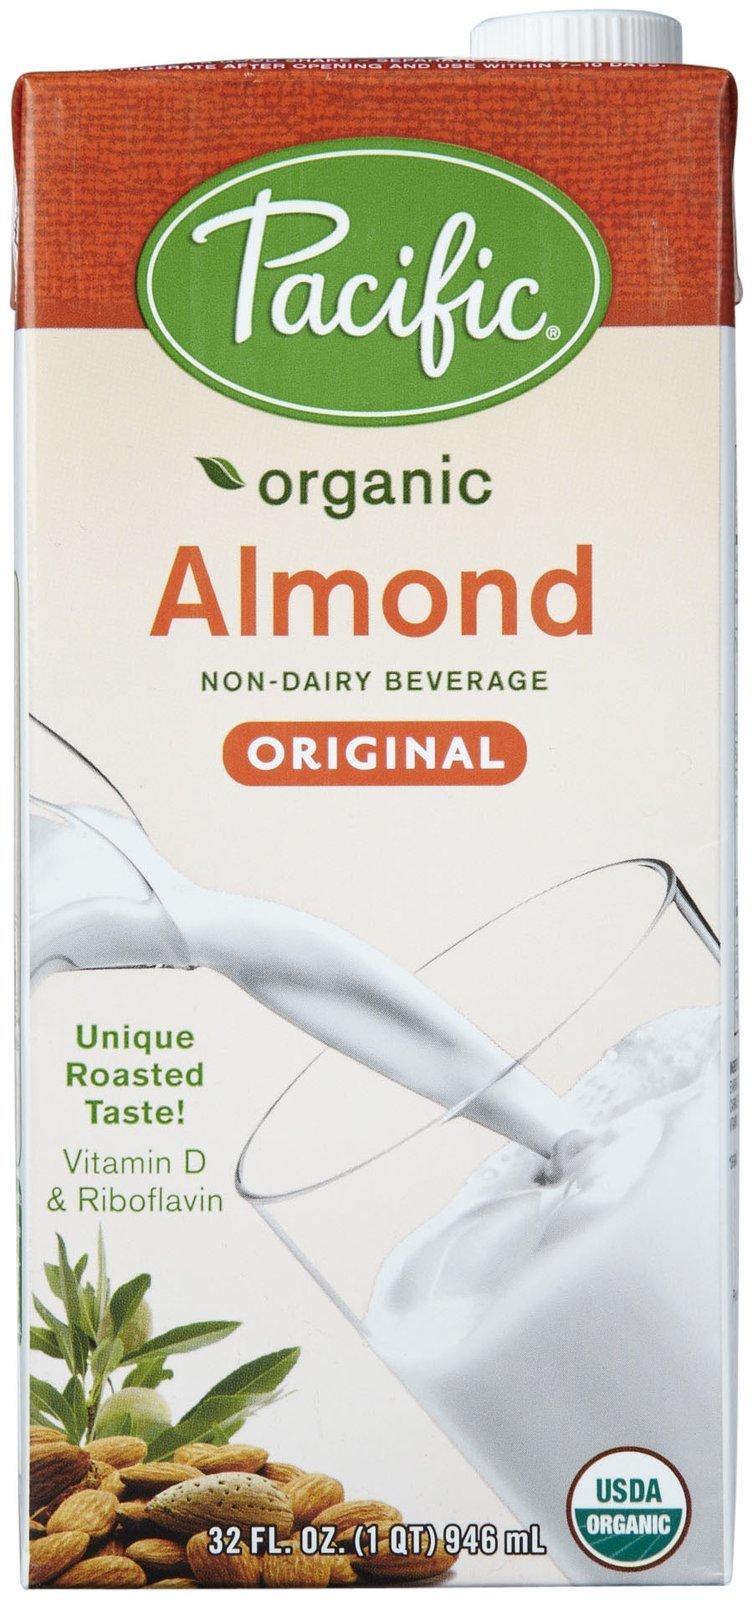 Pacific Natural Foods Organic Natural Almond Beverage - Original - 32 oz